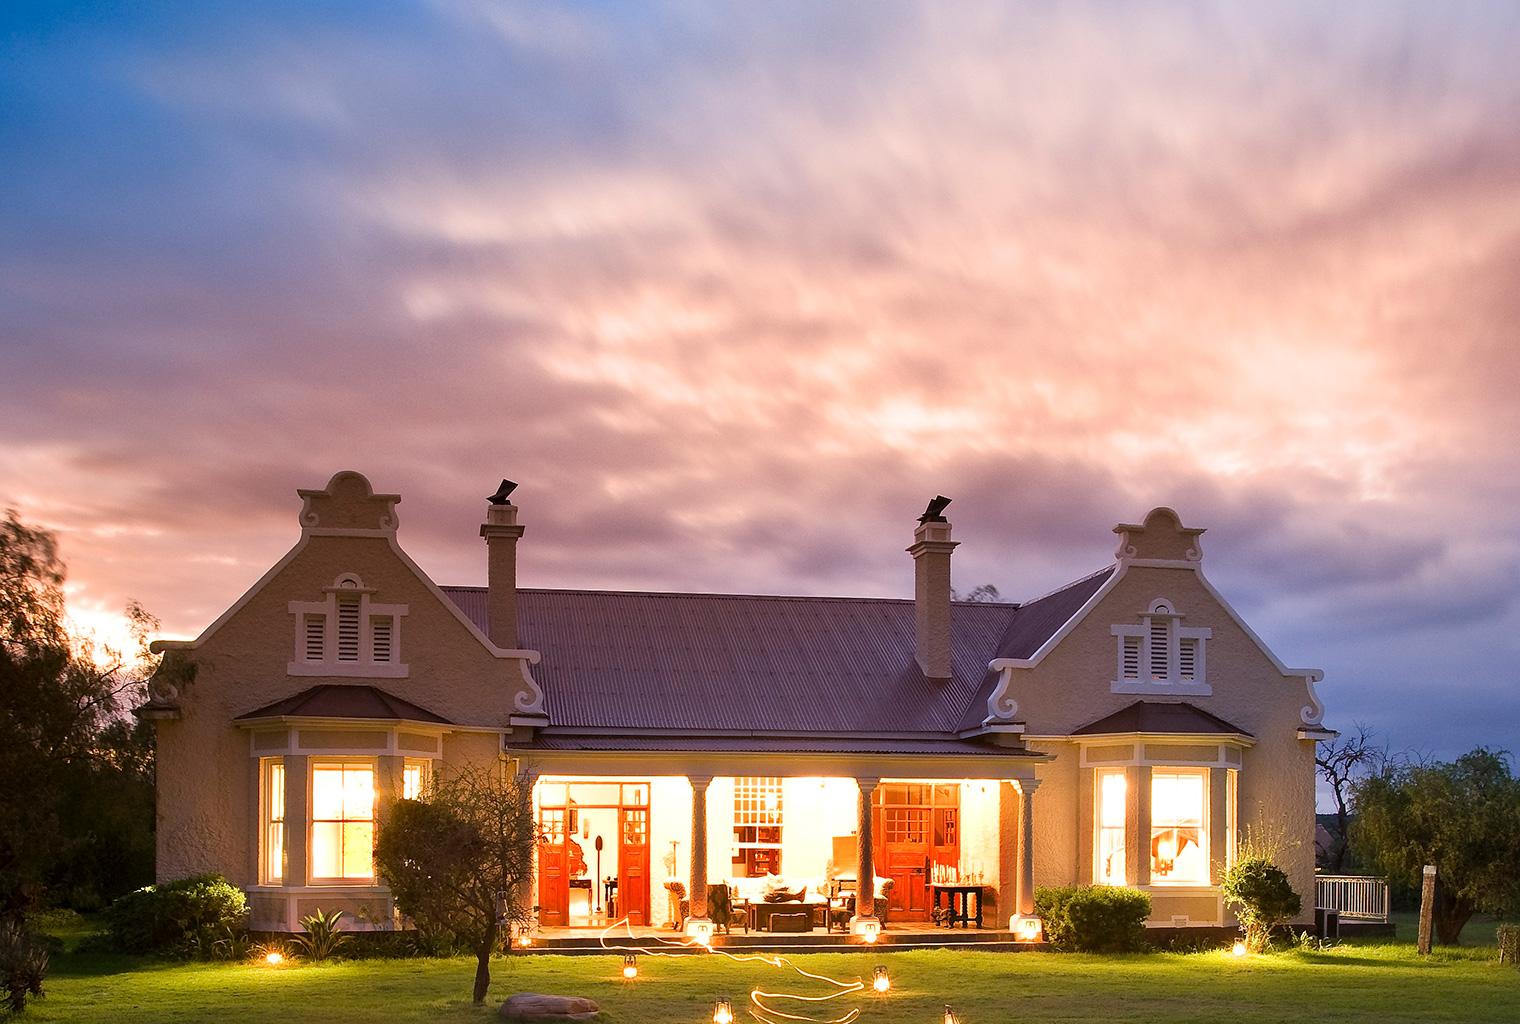 Uplands-Homestead-South-Africa-Exterior